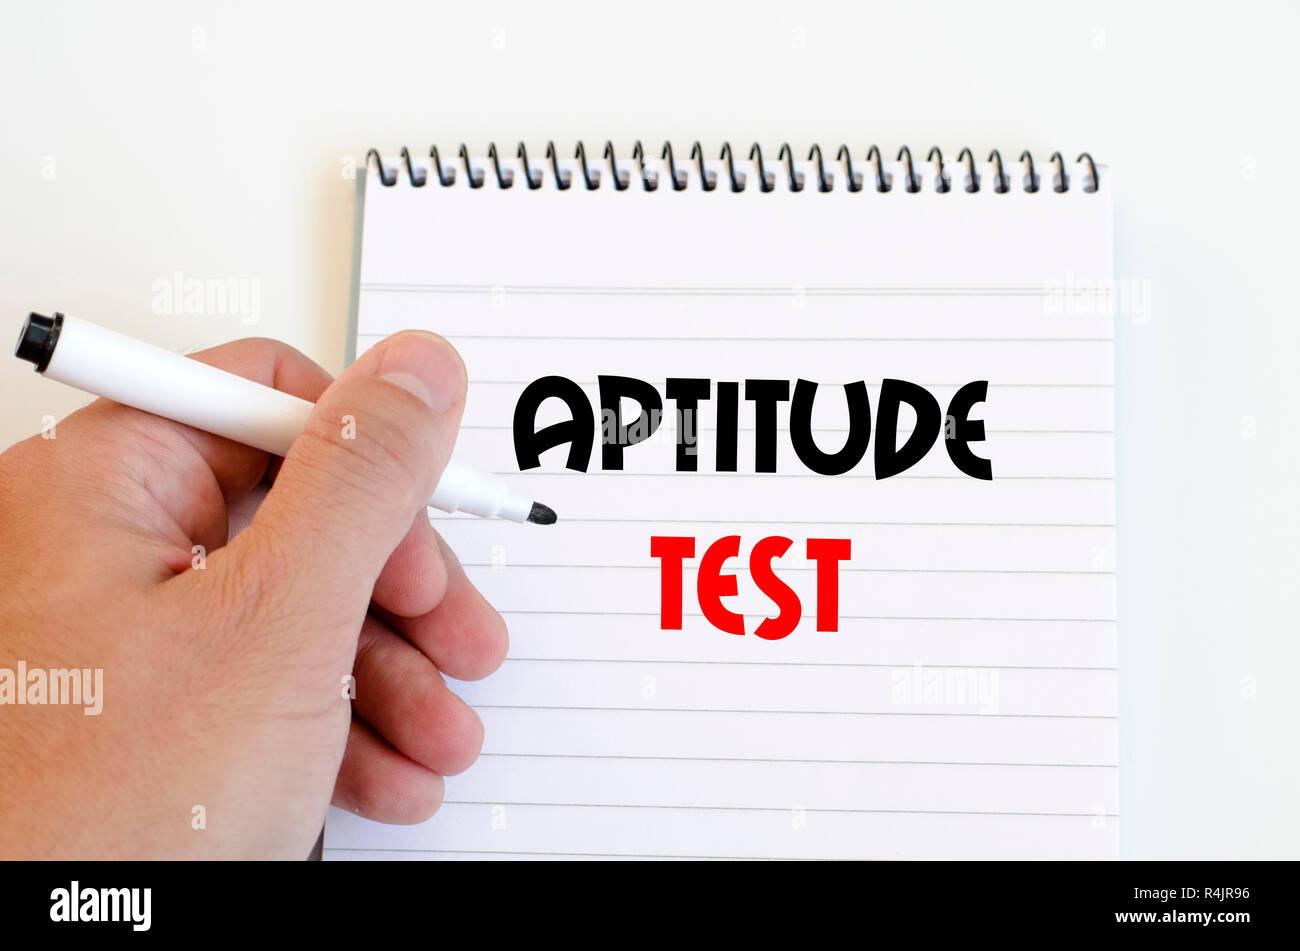 Aptitude Test Stock Photos & Aptitude Test Stock Images - Alamy